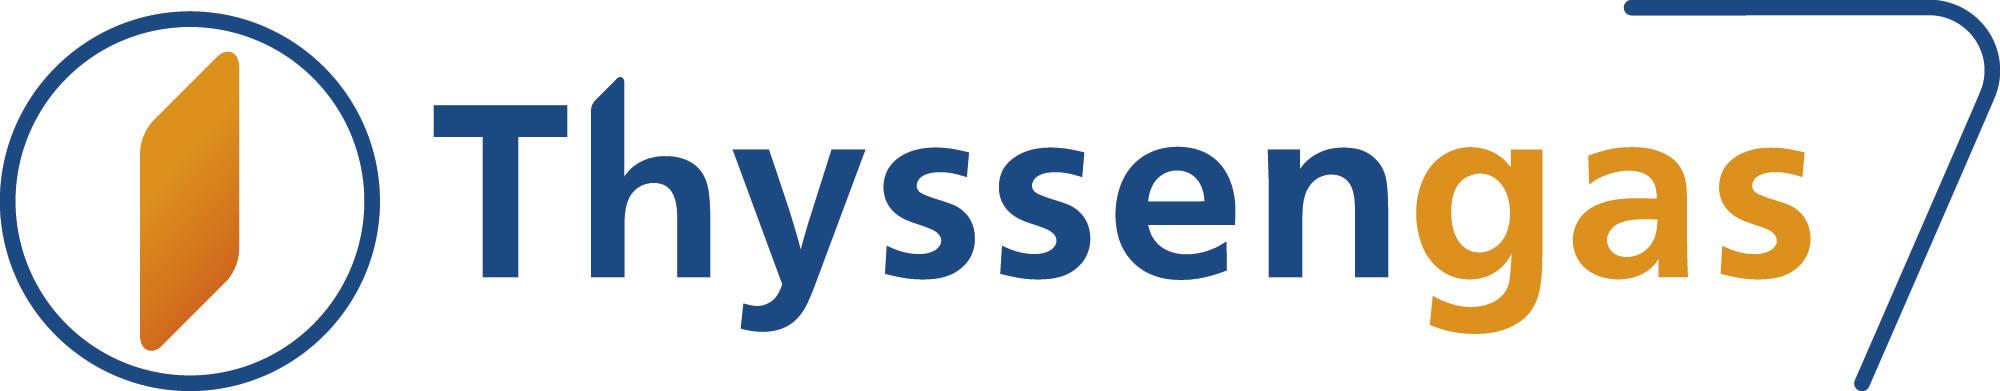 Thyssengas_Virtimo_Referenz